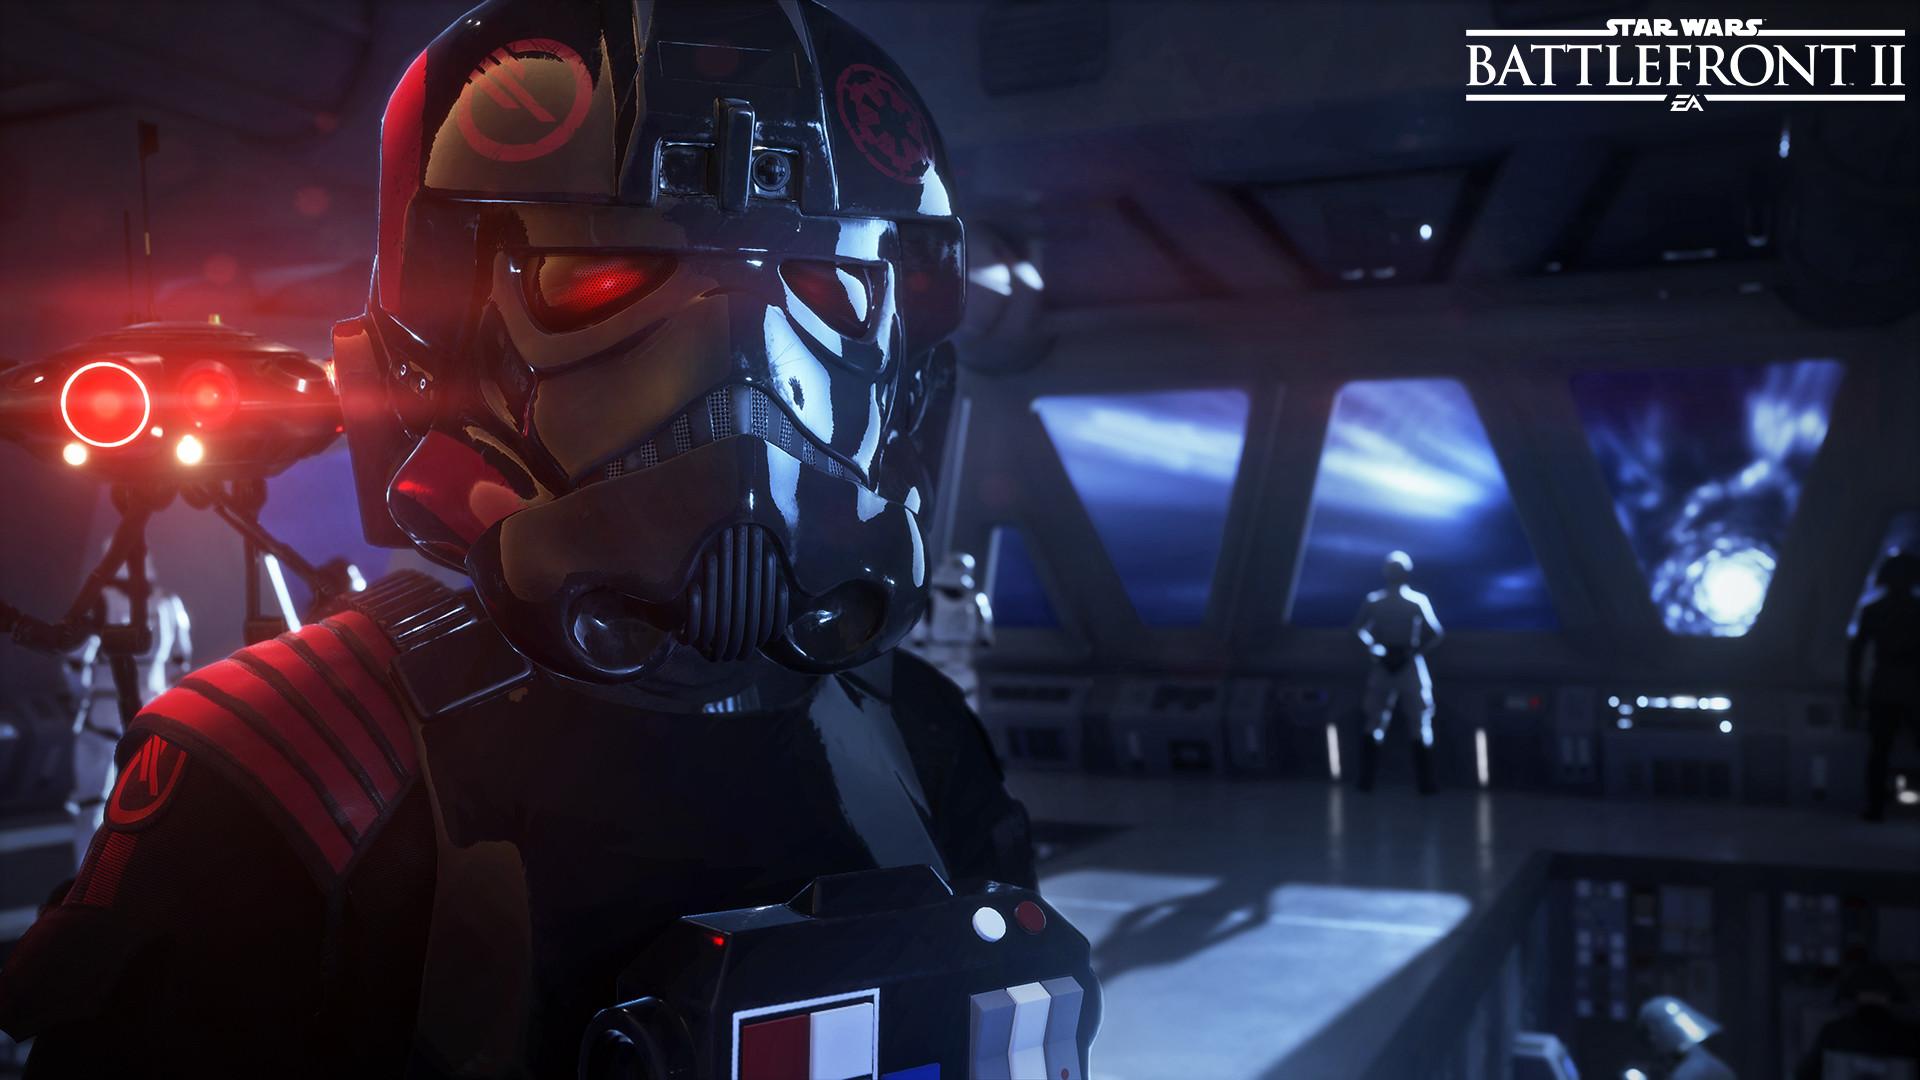 Video Game – Star Wars Battlefront II (2017) Stormtrooper Wallpaper